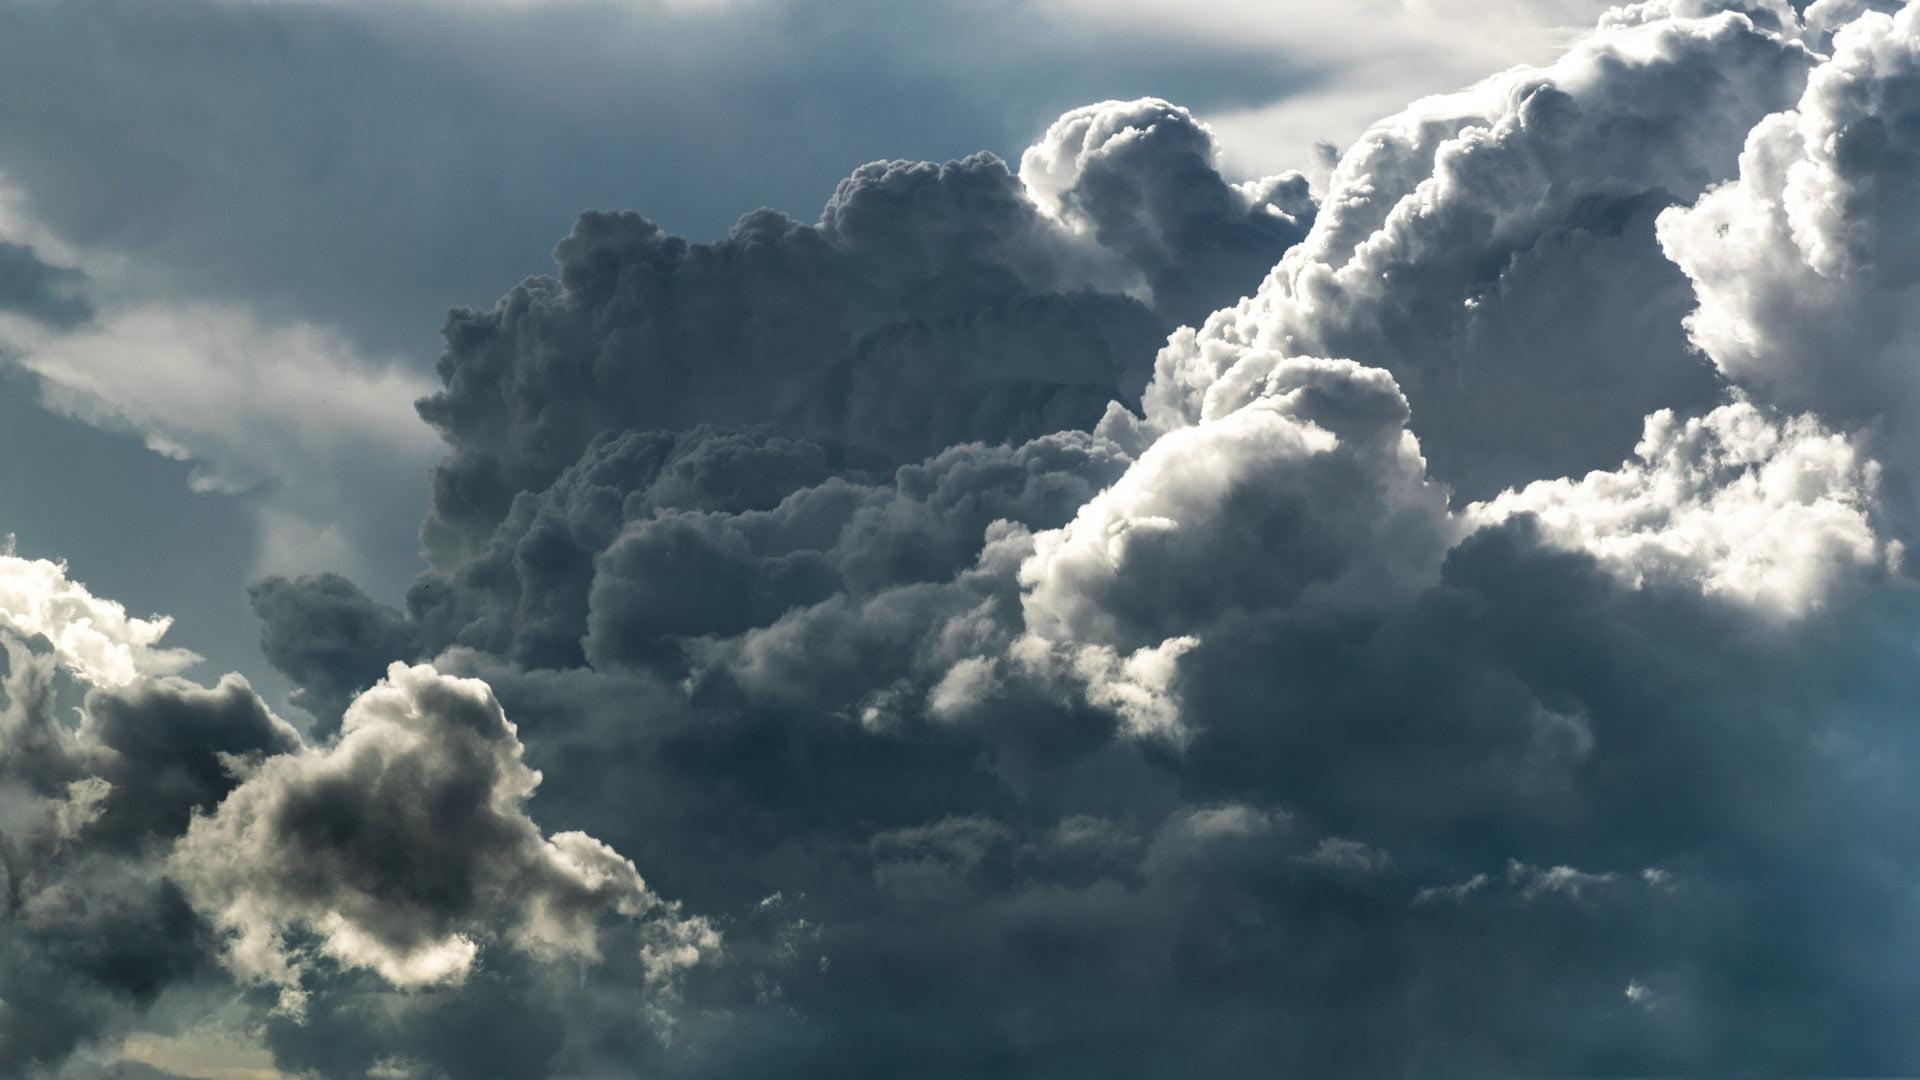 grey white clouds sky weather 1 1 失樂園|卡特朱魯/灰姑娘詩選